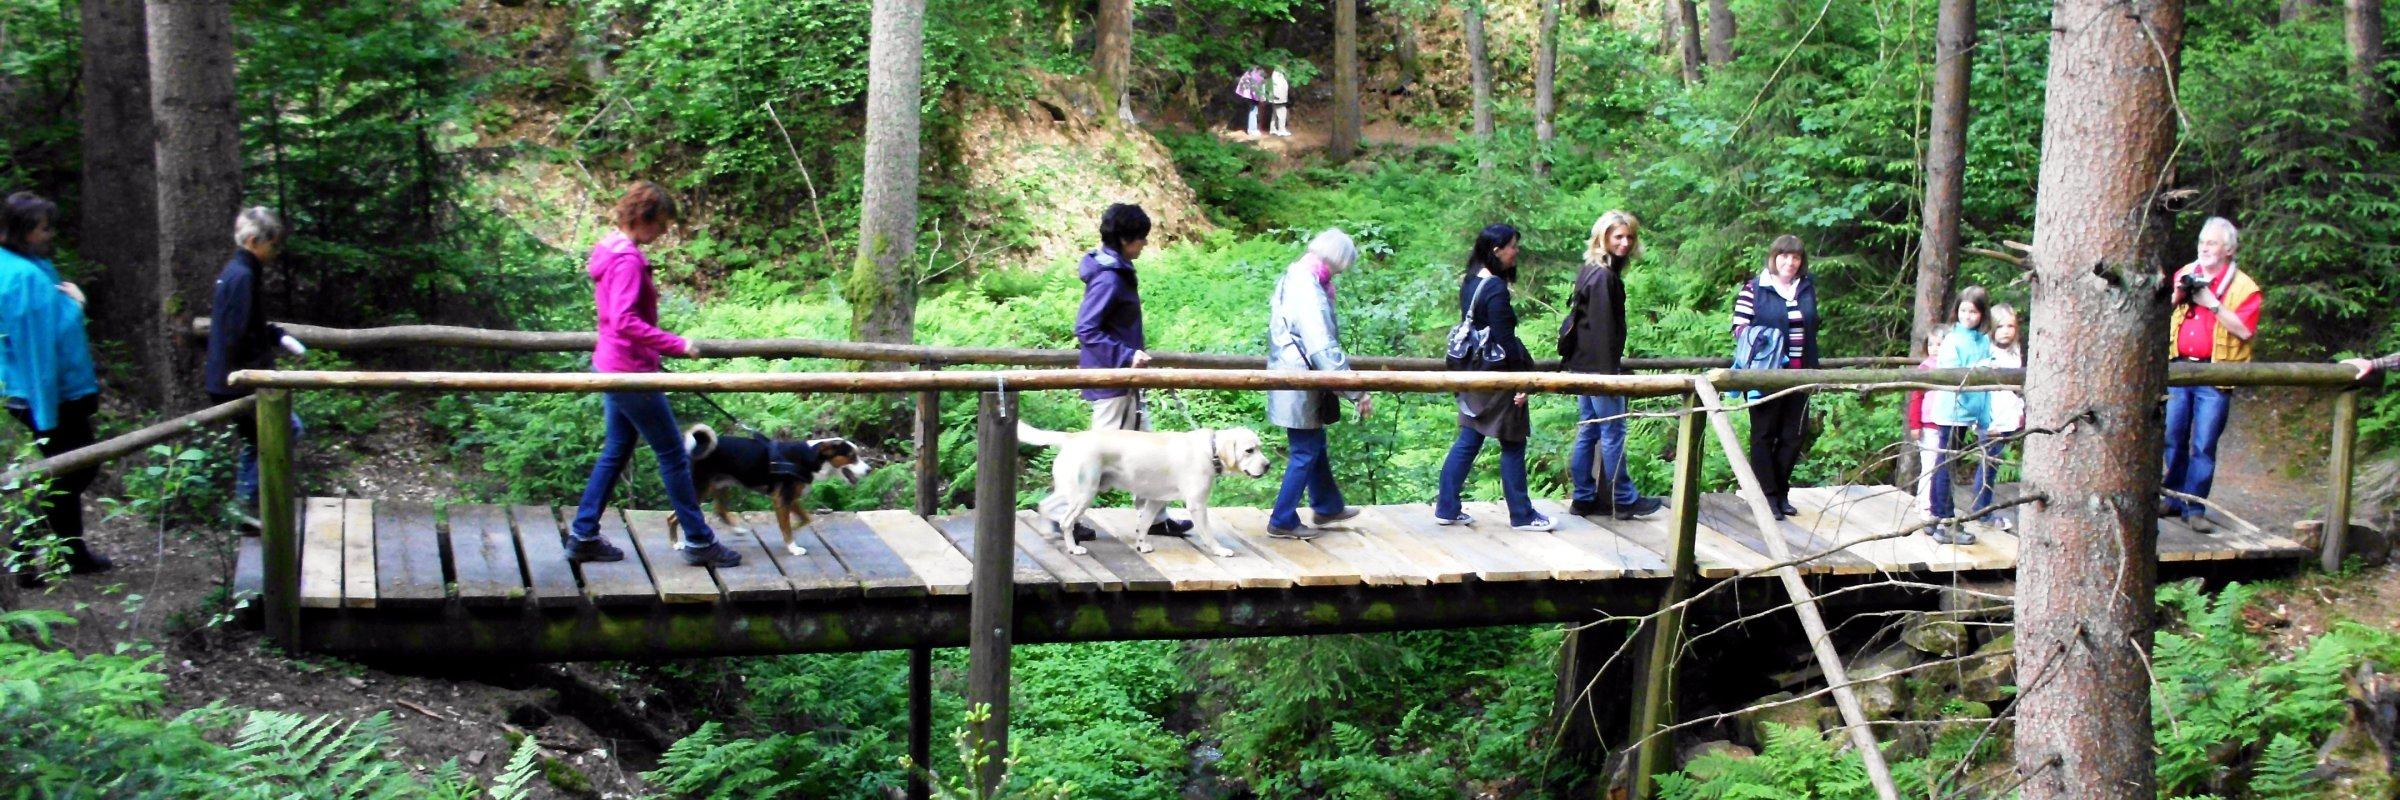 Homberg Efze Tourismus